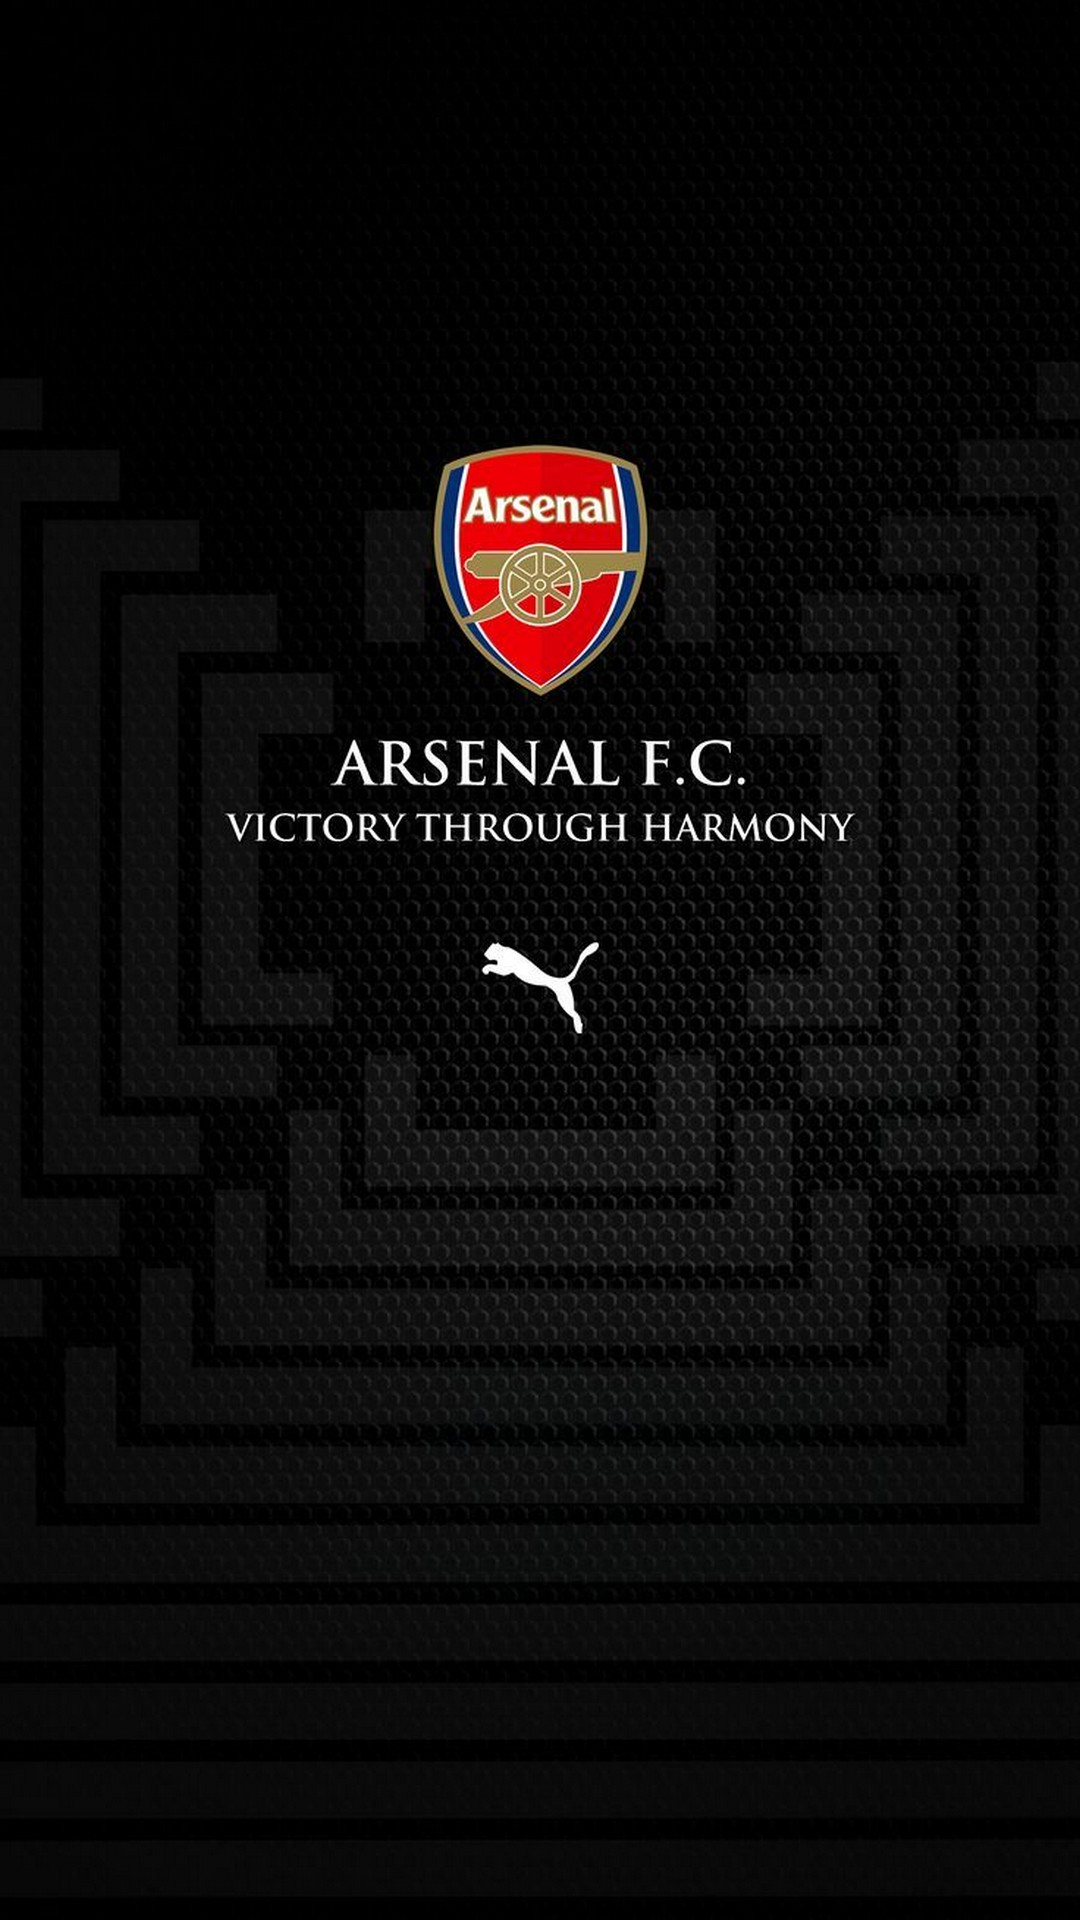 Arsenal FC Wallpaper iPhone 2020 3D iPhone Wallpaper 1080x1920